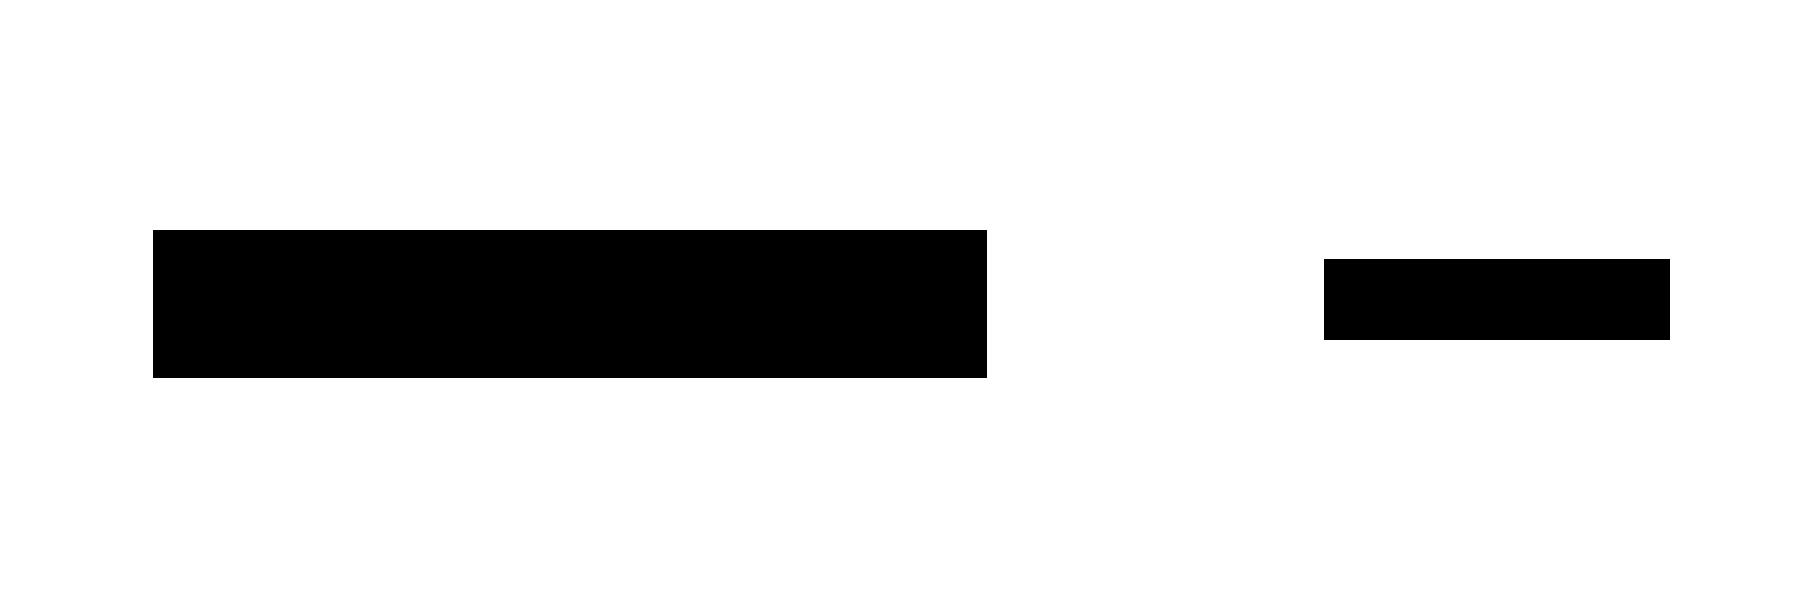 01_SunsetStudios_Logos_06B